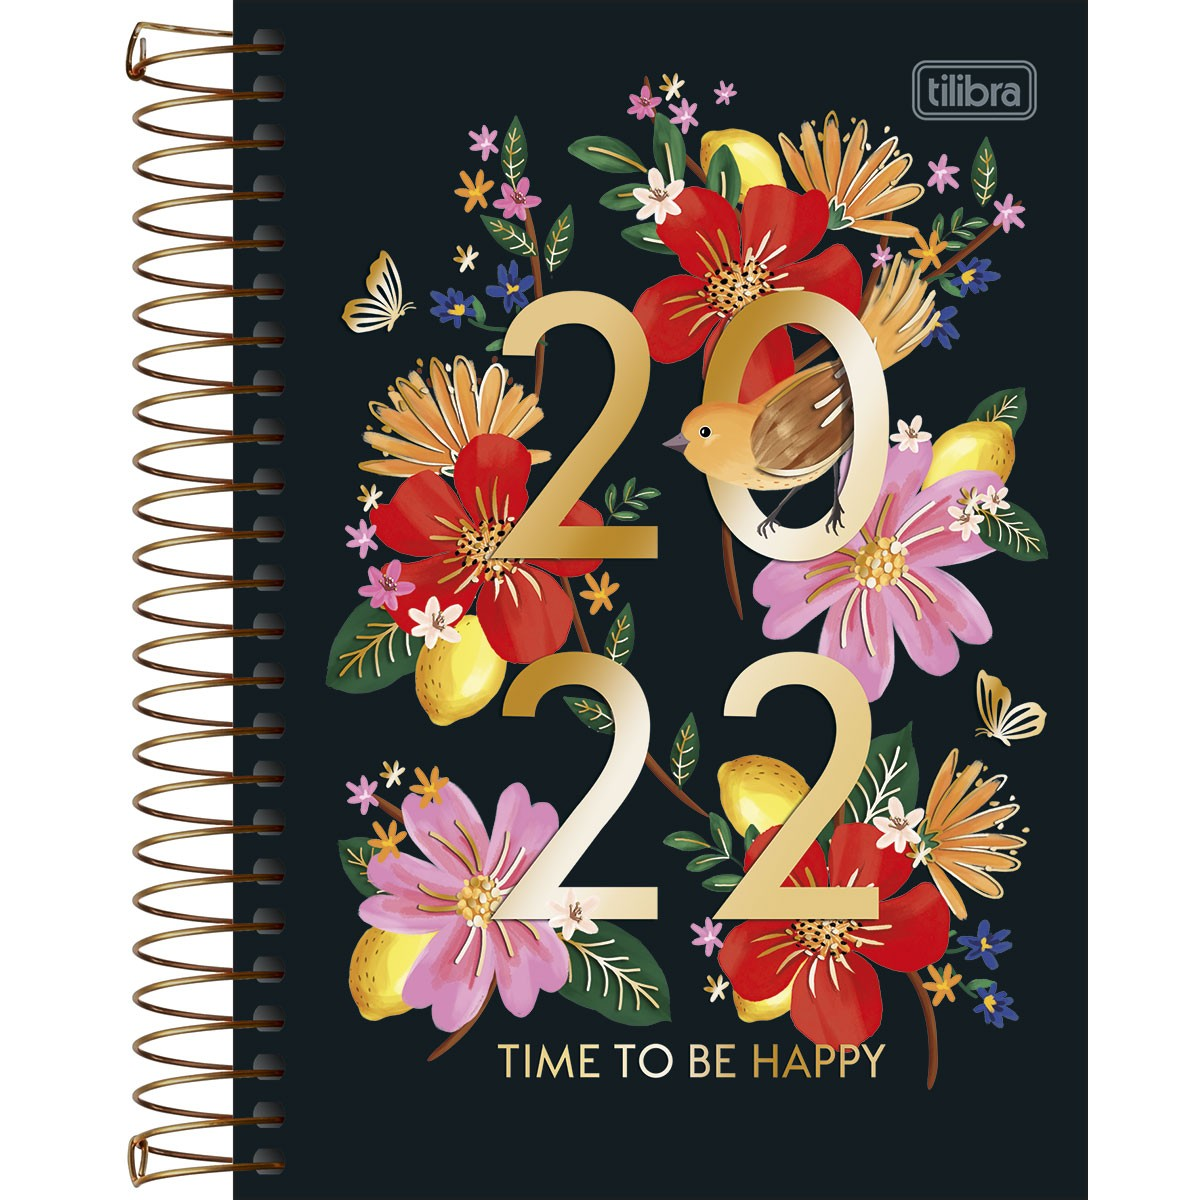 Agenda Espiral Diária 14 x 20 cm Le Vanille 2022